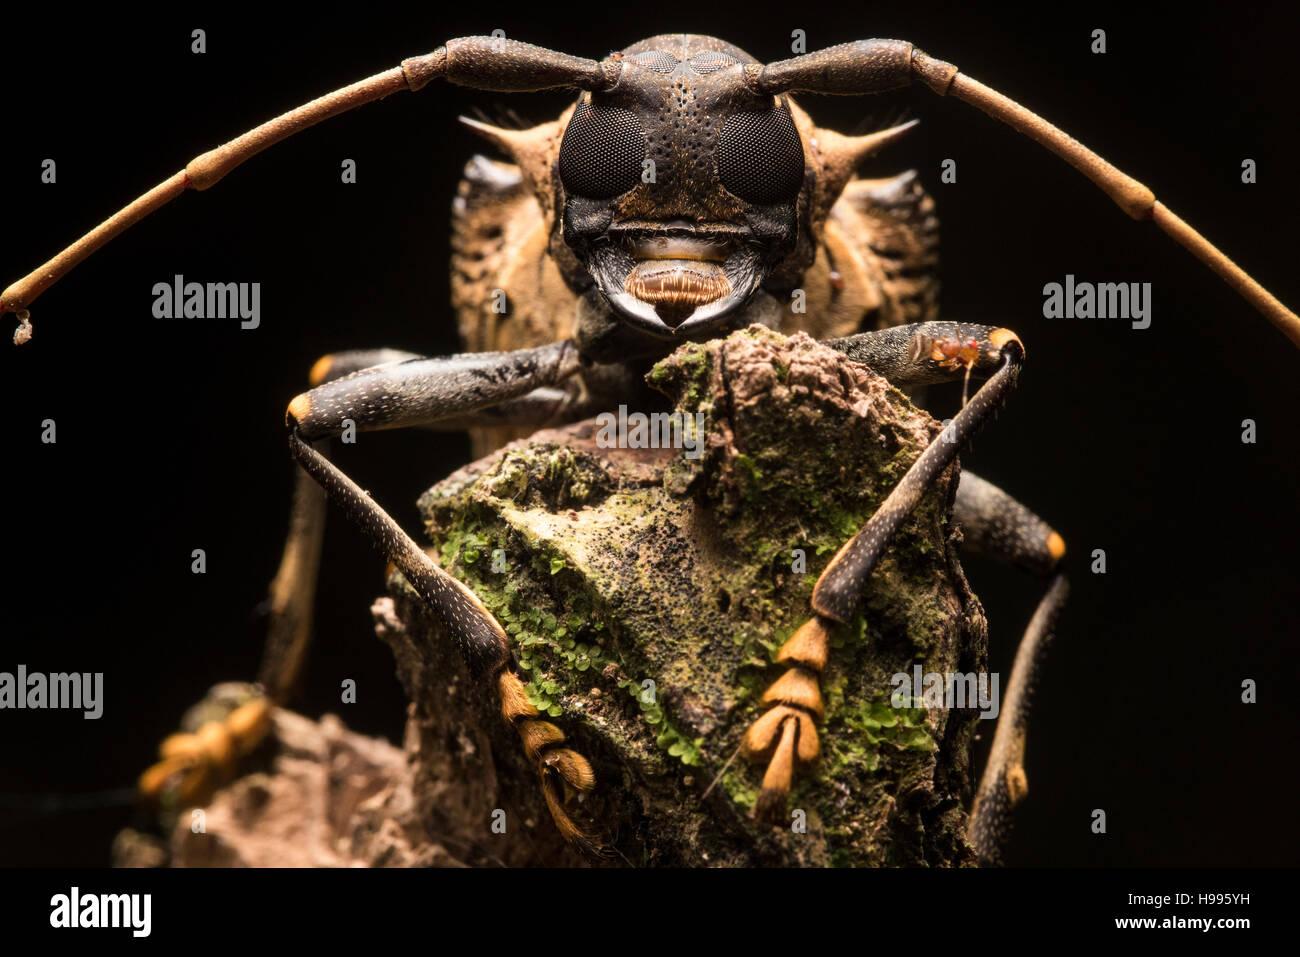 Ein Käfer-Porträt aus dem peruanischen Dschungel. Stockbild